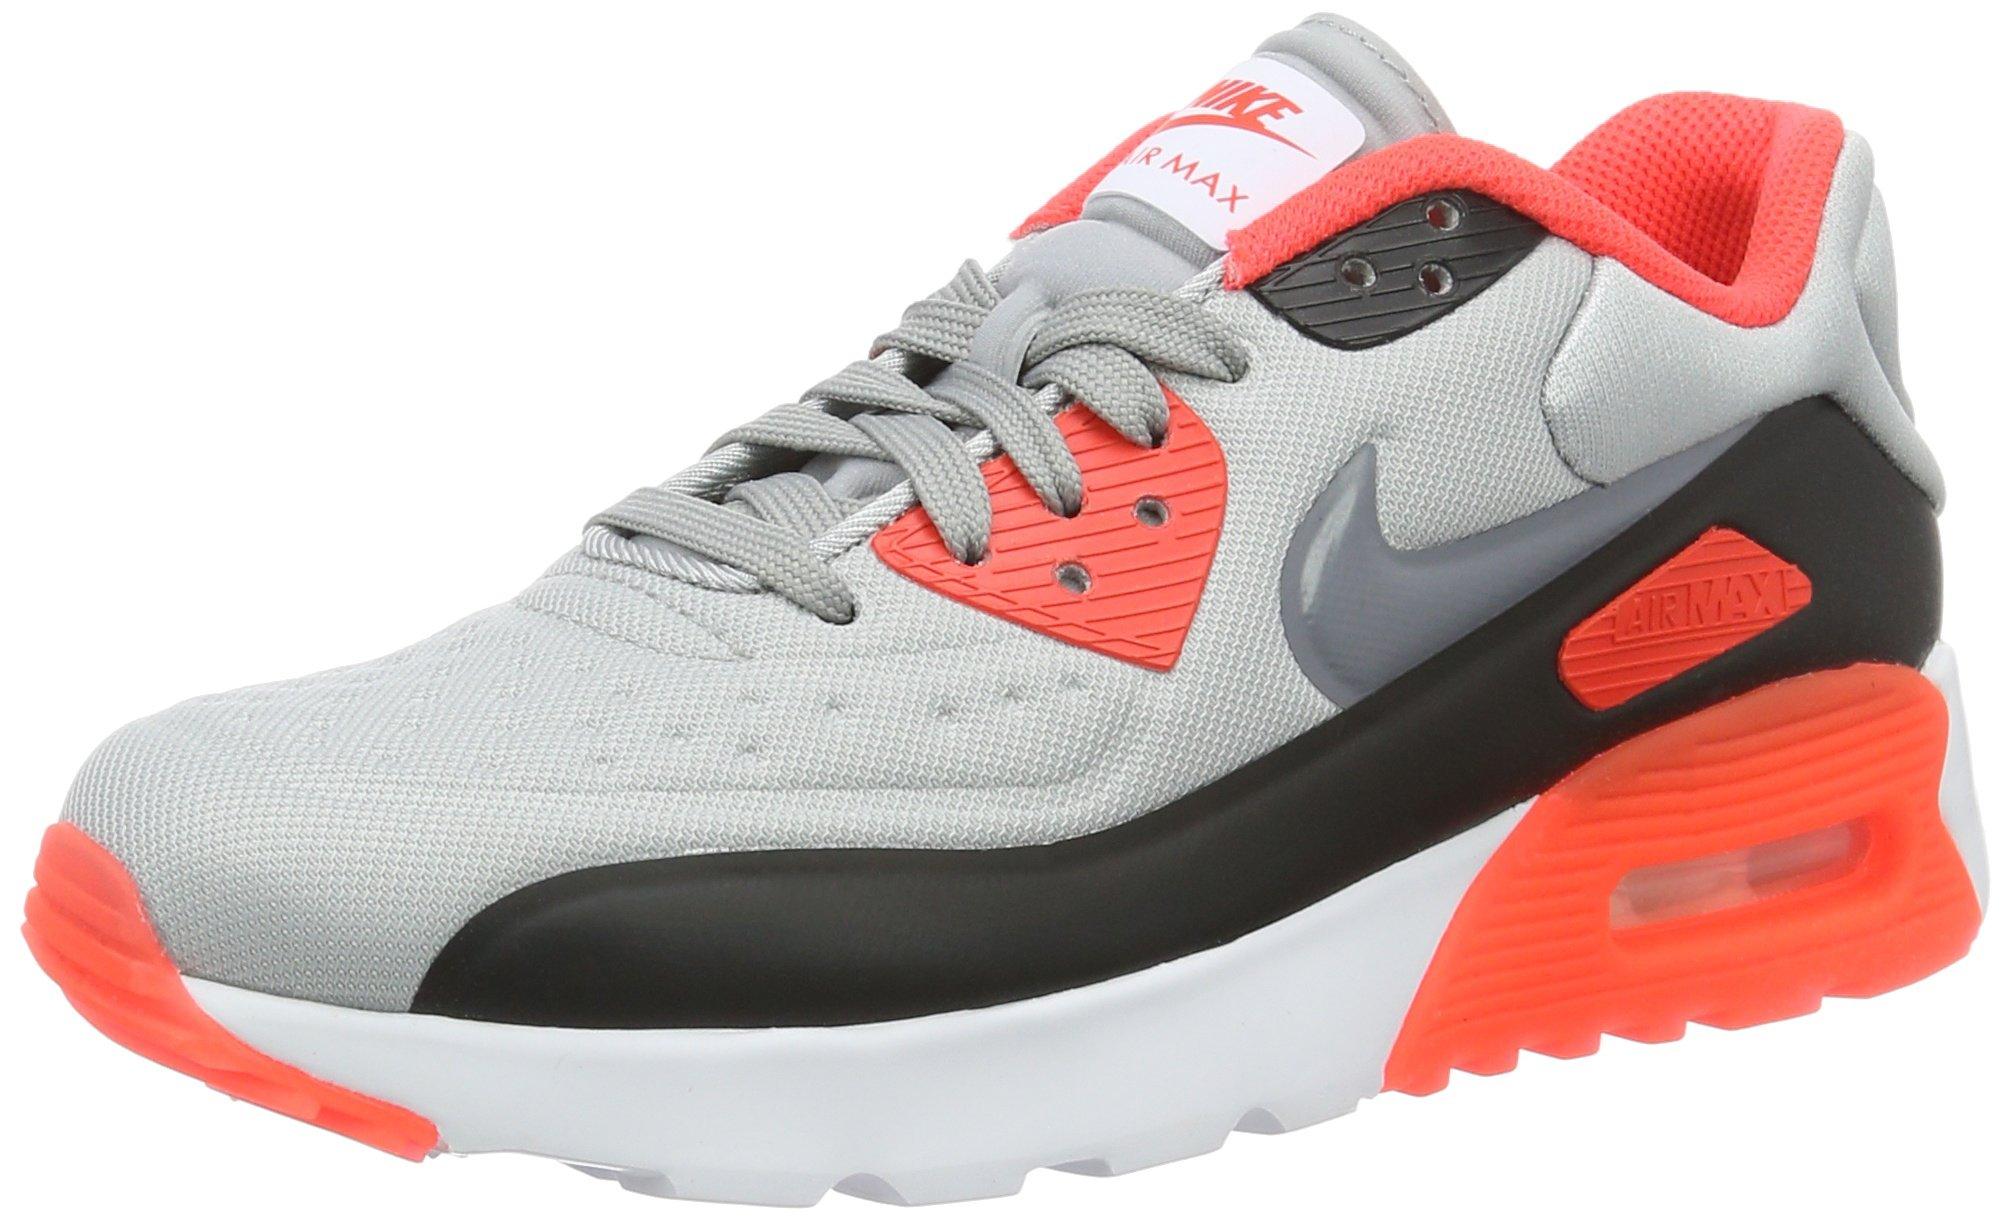 the best attitude 479d4 e0305 Nike air Max 90 Ultra Se (GS), Chaussures de Course garçon, Gris (Wolf Cool  Grey-Bright Crimson-Black), 37 1/2 EU